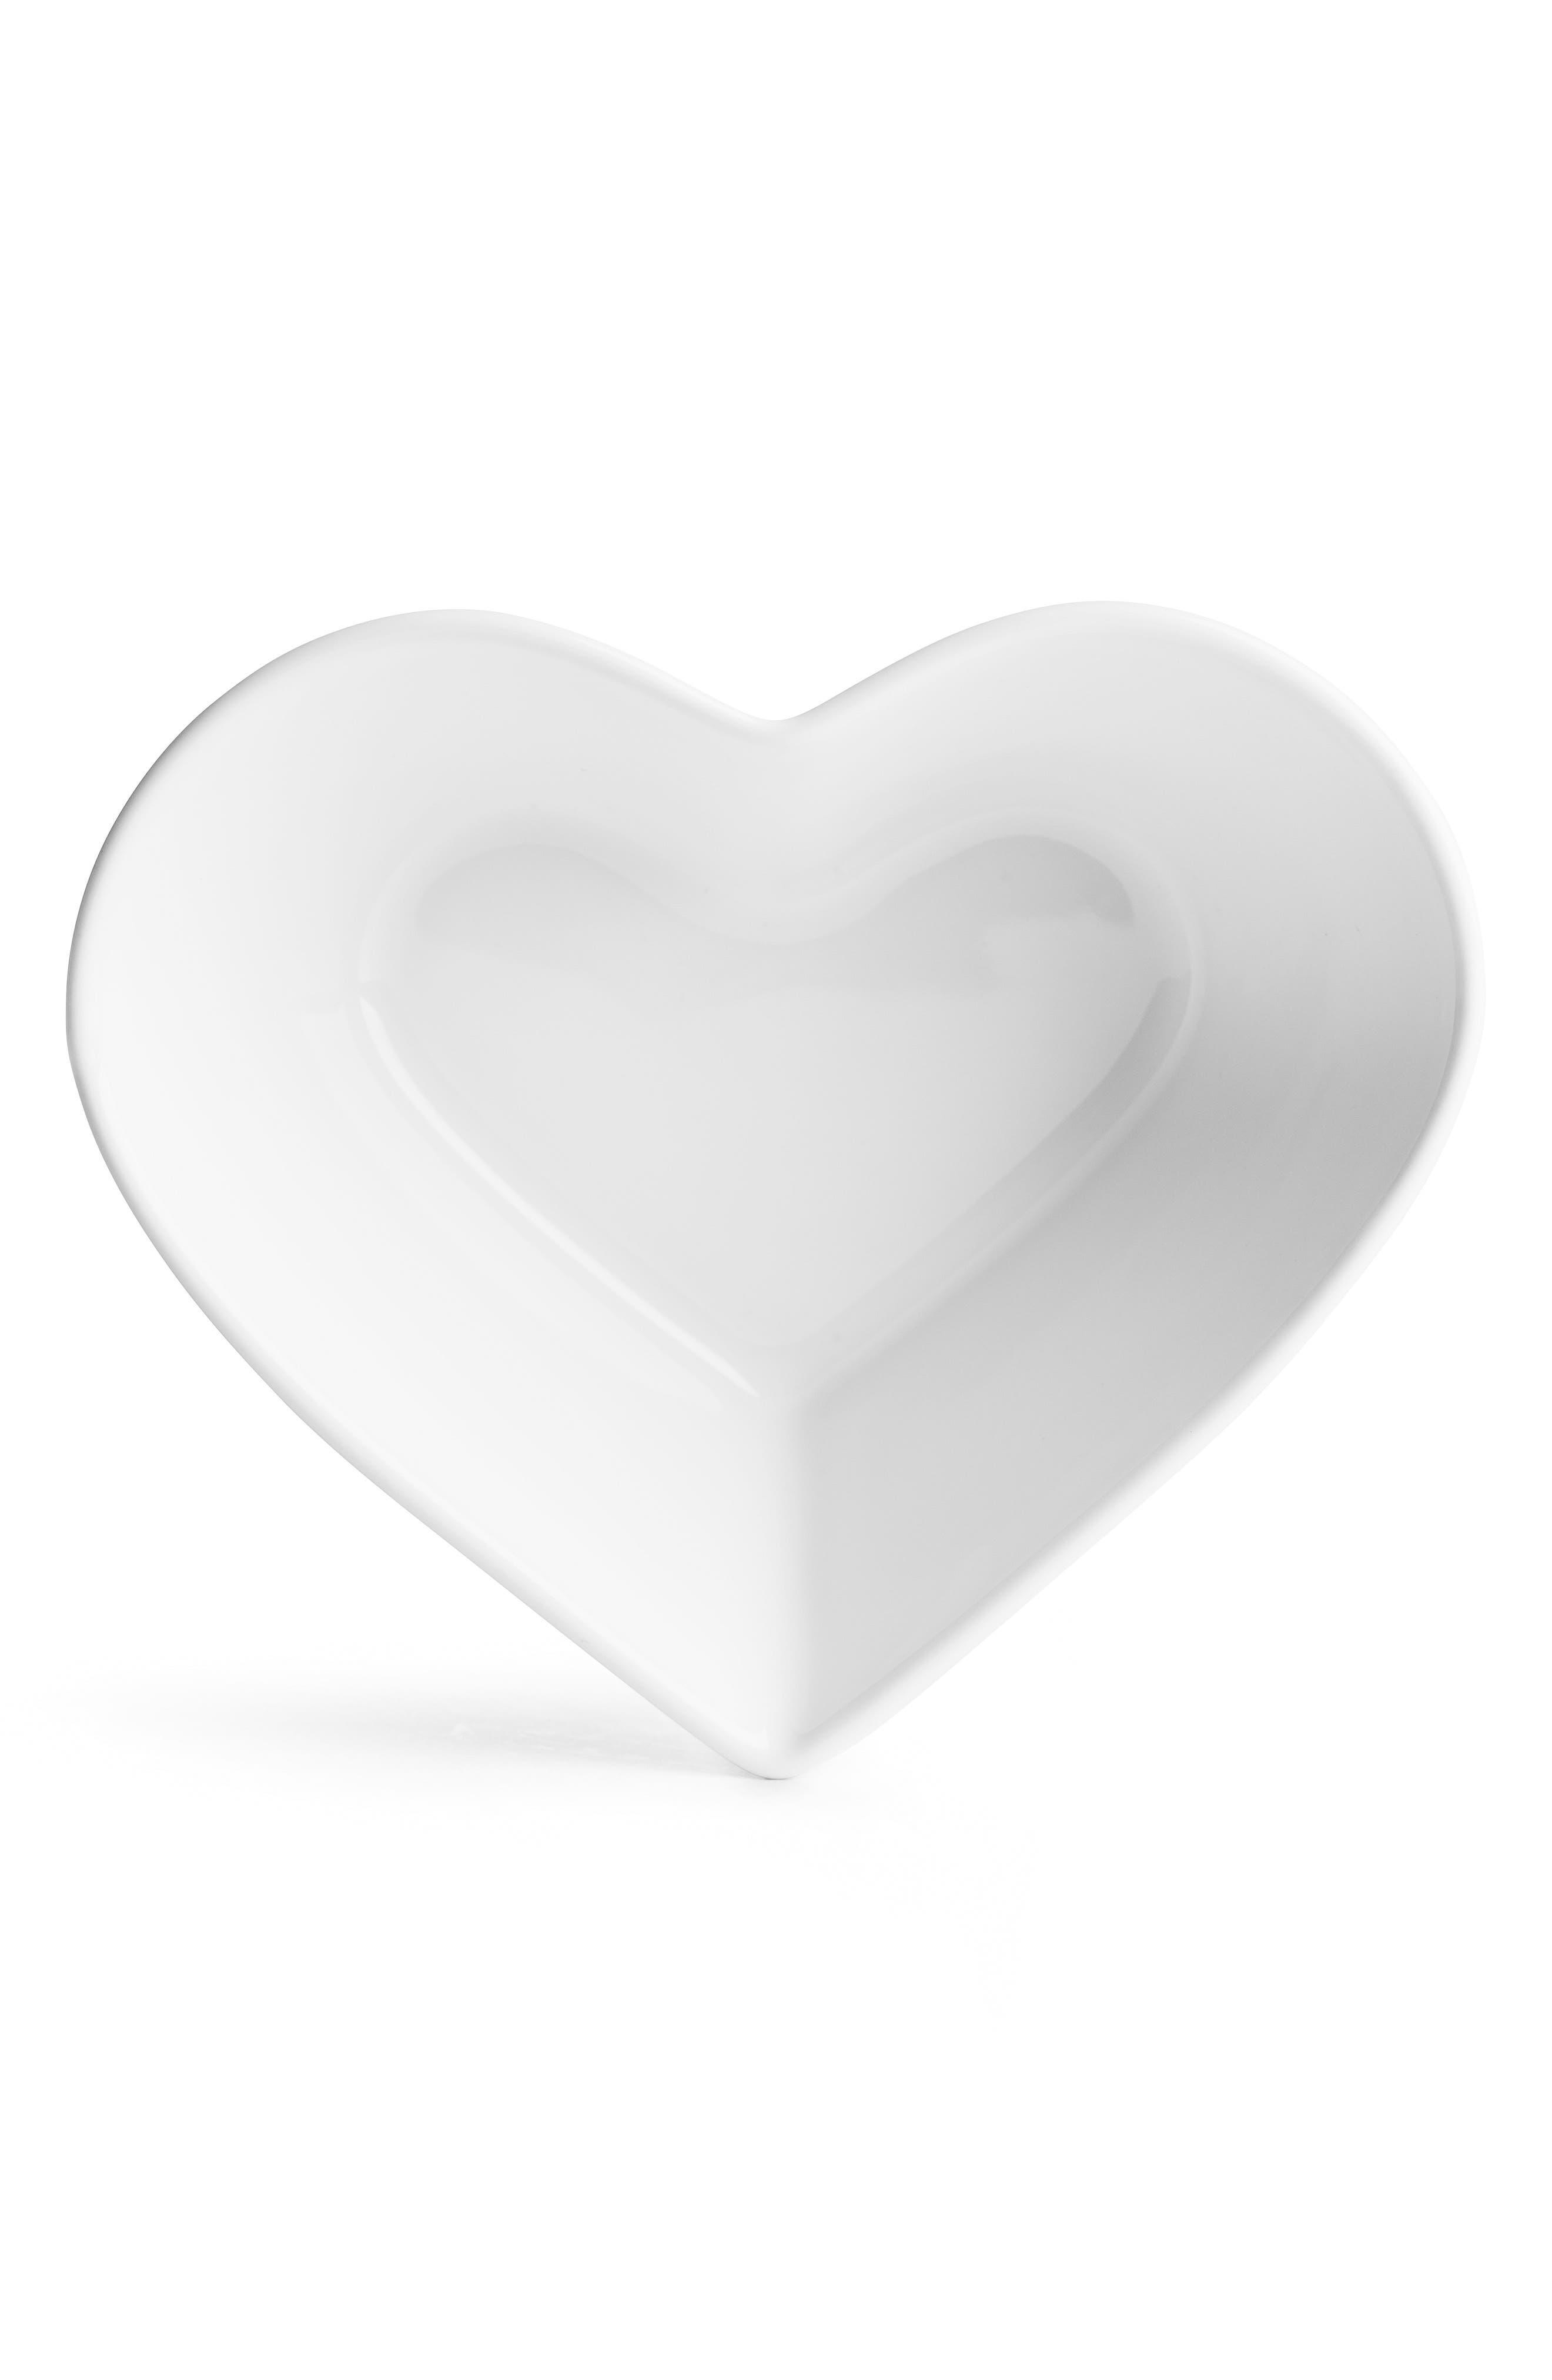 Heart Serving Bowl,                             Main thumbnail 1, color,                             WHITE